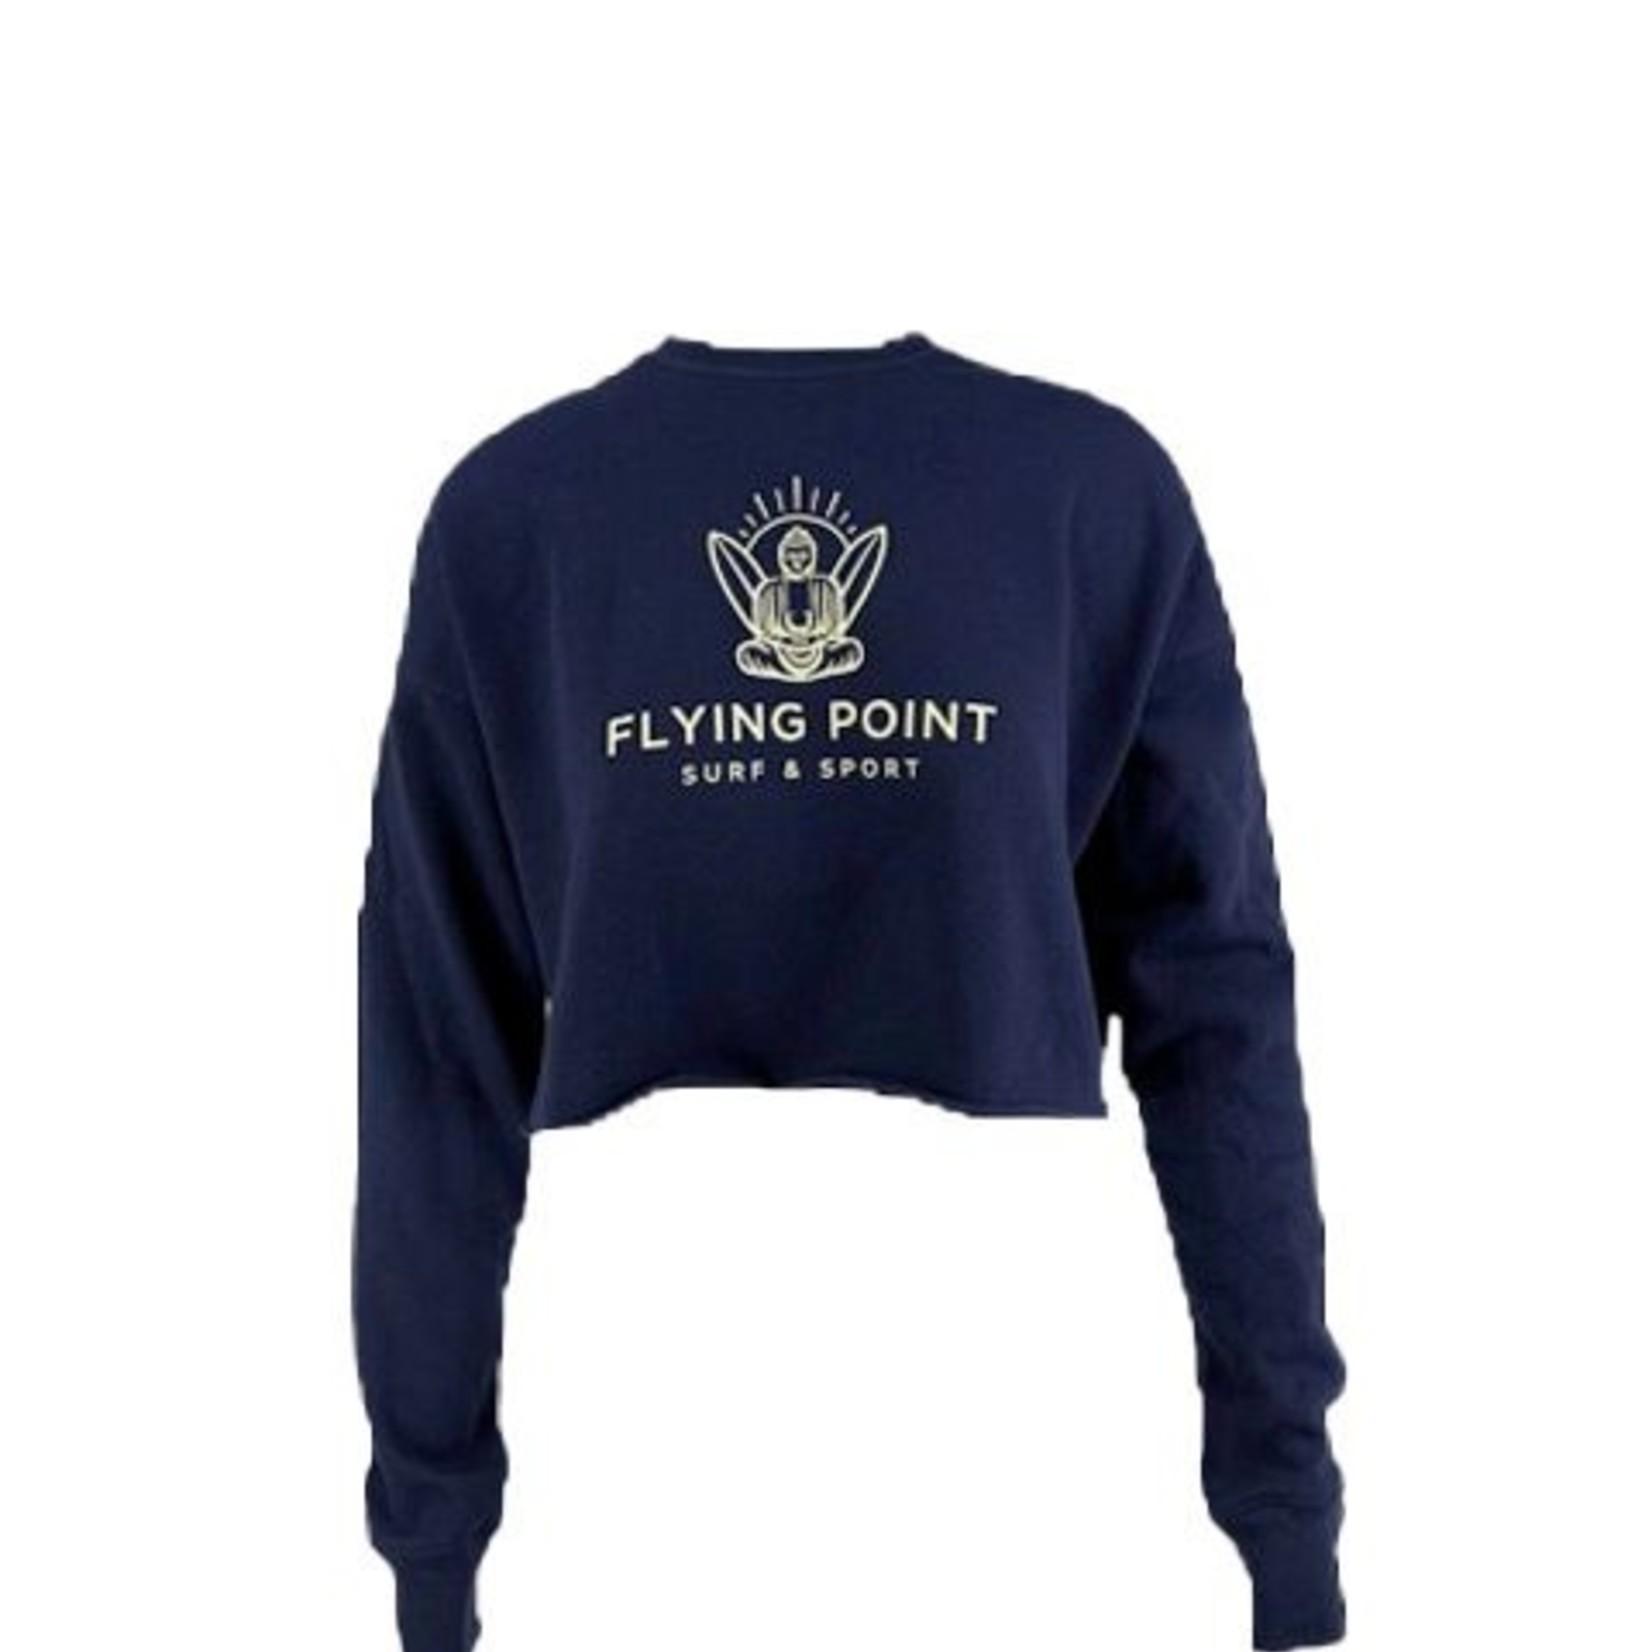 Flying Point FP Buddha Crop  Crew Neck Navy